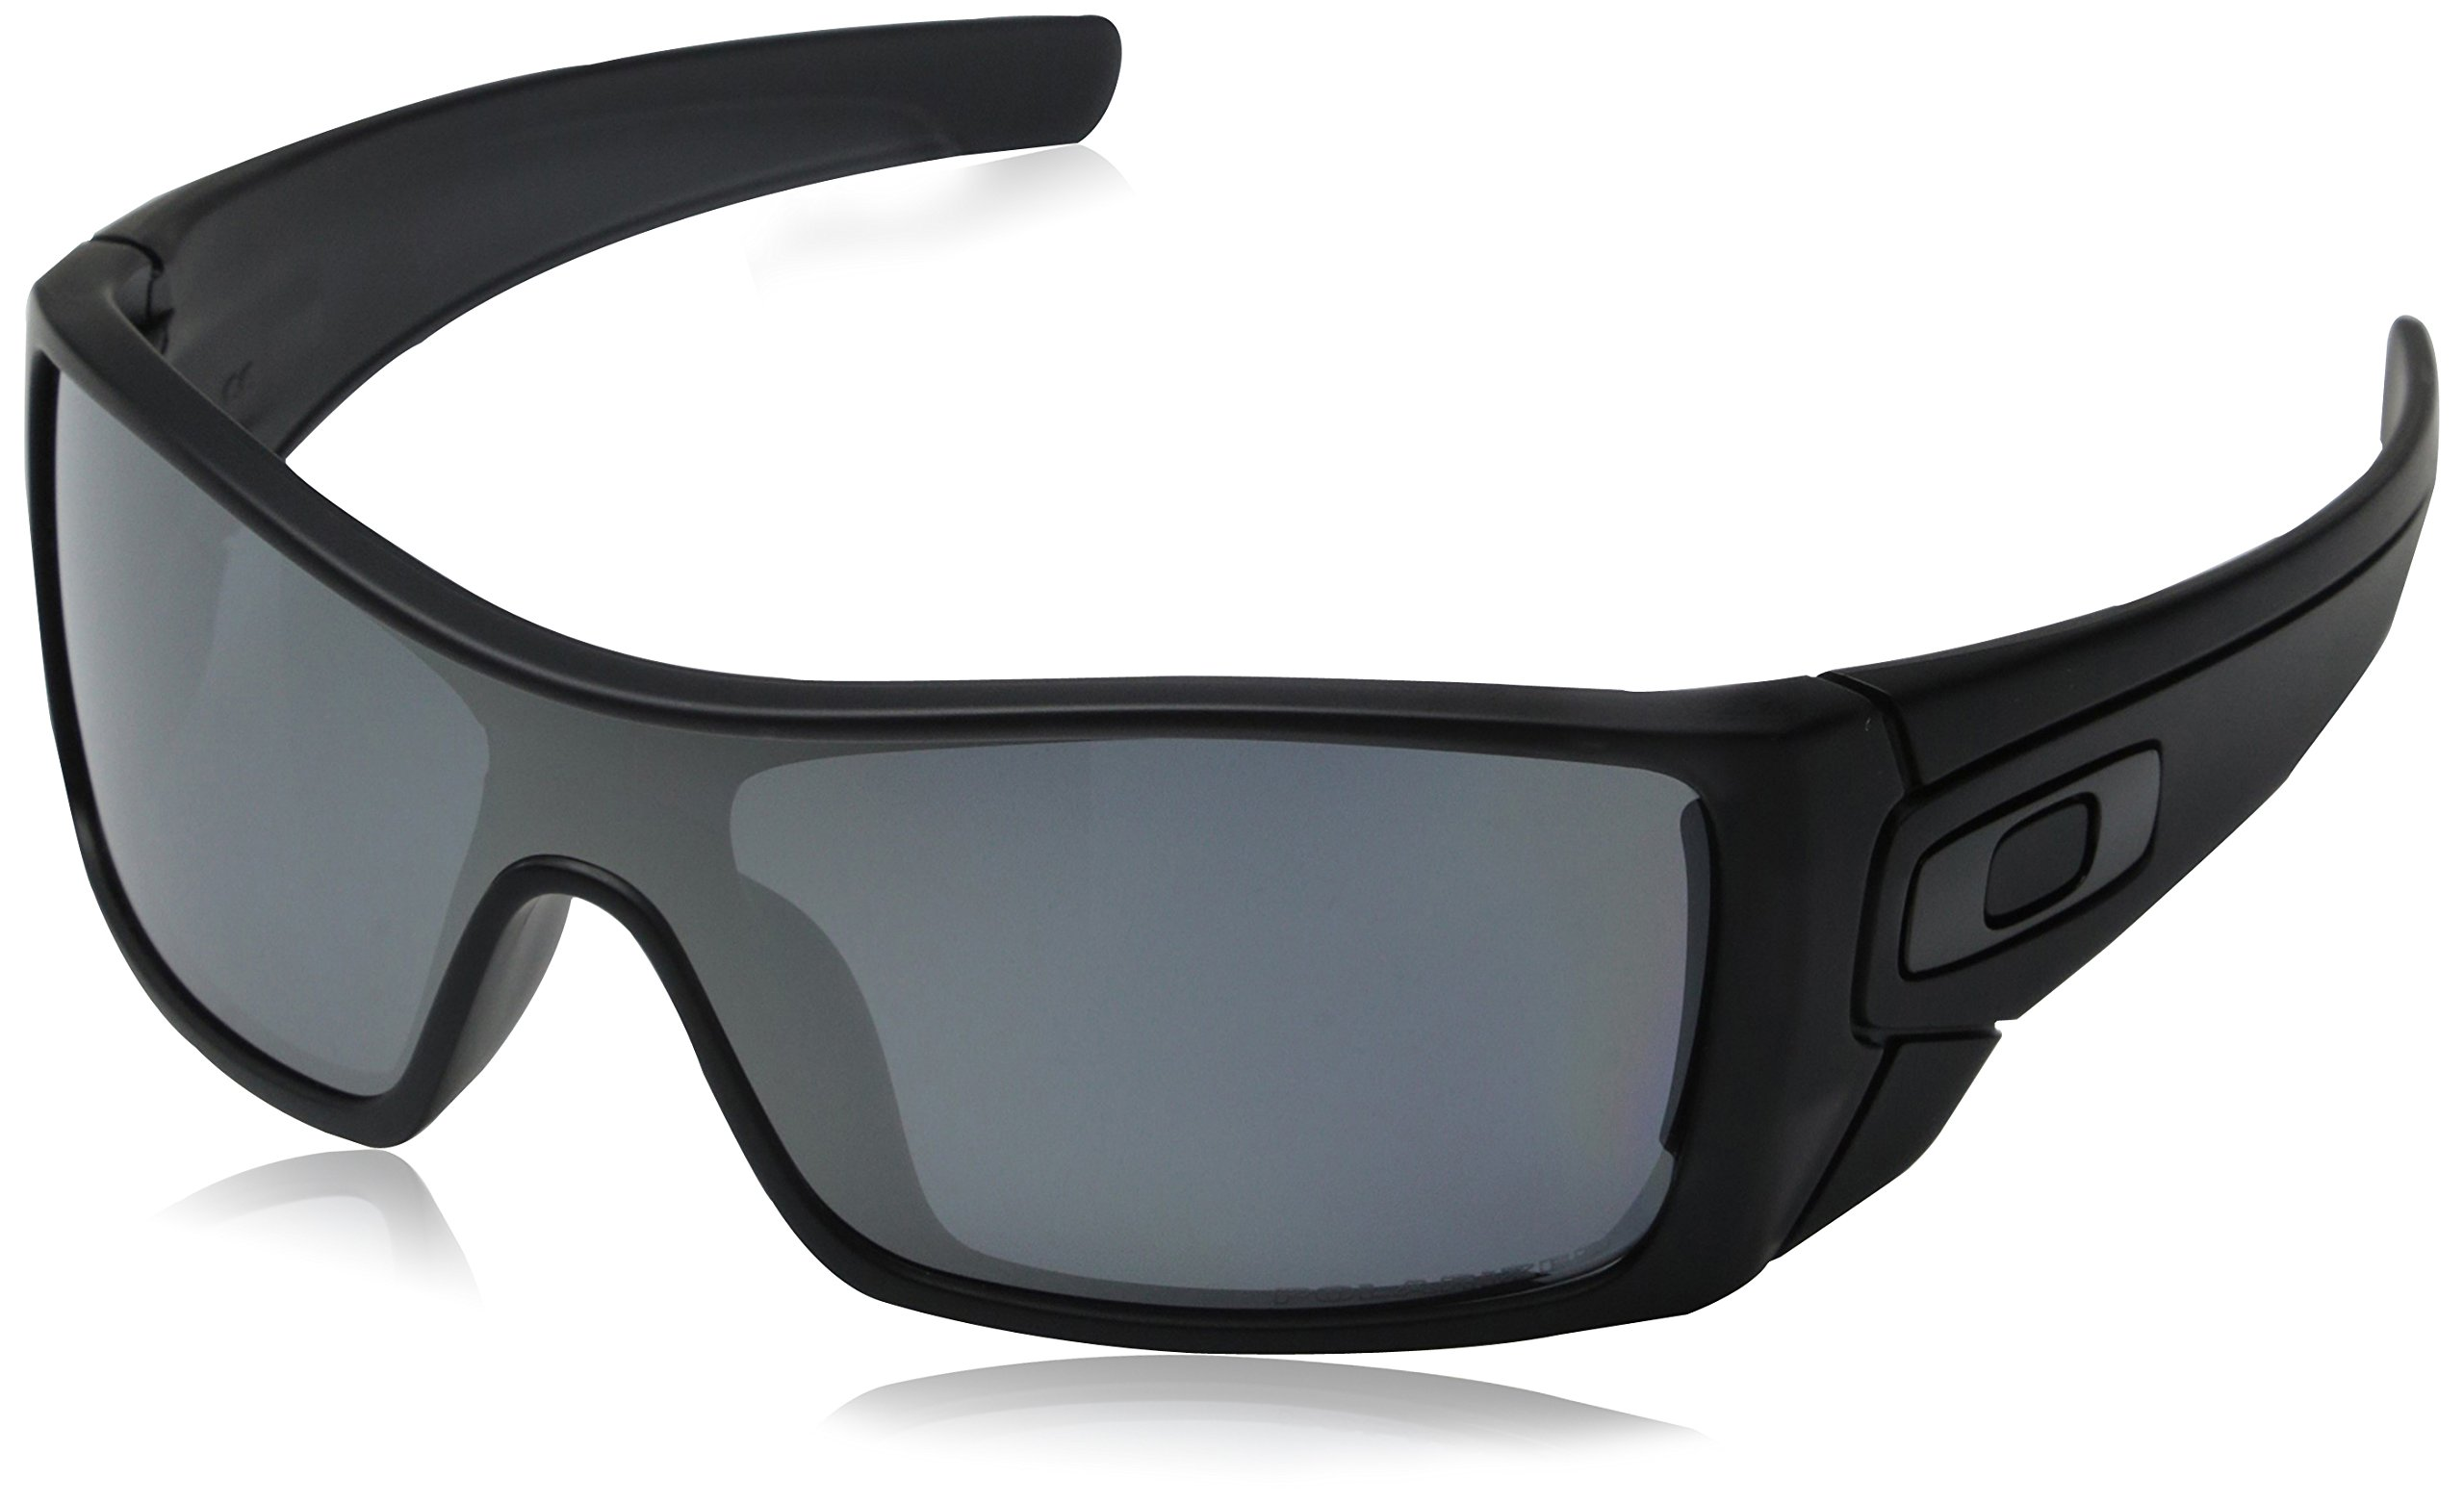 Oakley mens Batwolf OO9101-35 Iridium Polarized Sport Sunglasses,Matte Black Ink Frame/Black Iridium Lens,127 mm